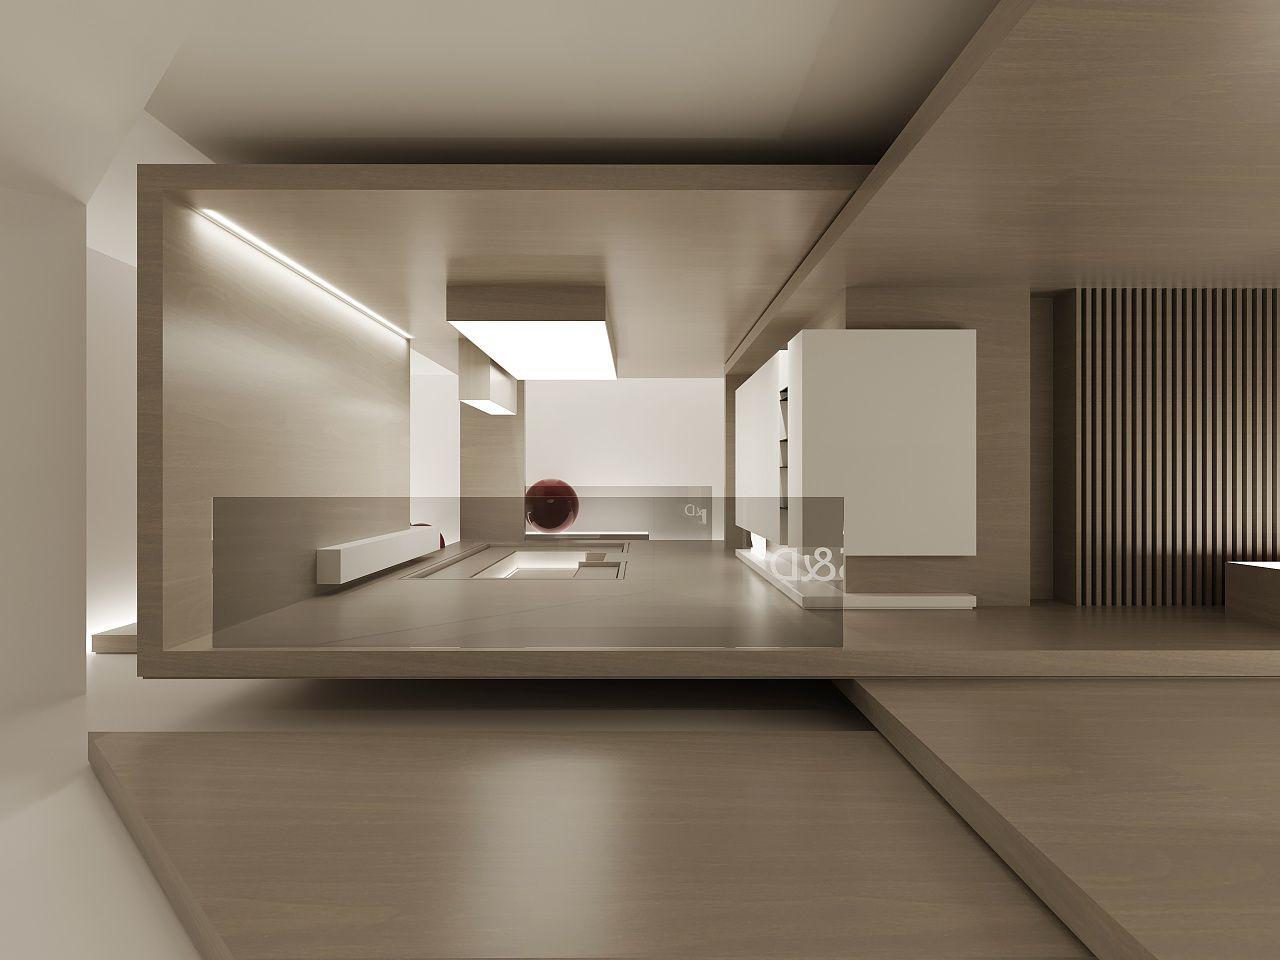 Bd Sdjd 原创作品 站酷 Zcool Bathroom Interior Design